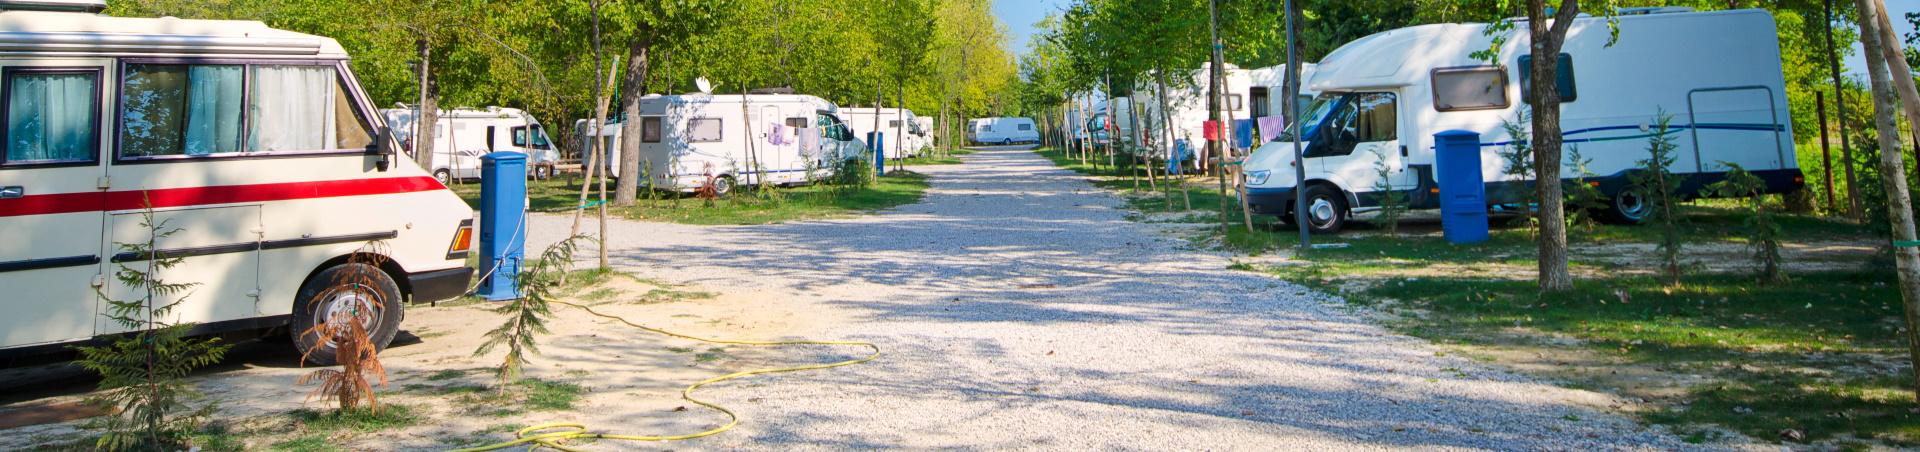 Camping Belag HanseGrand